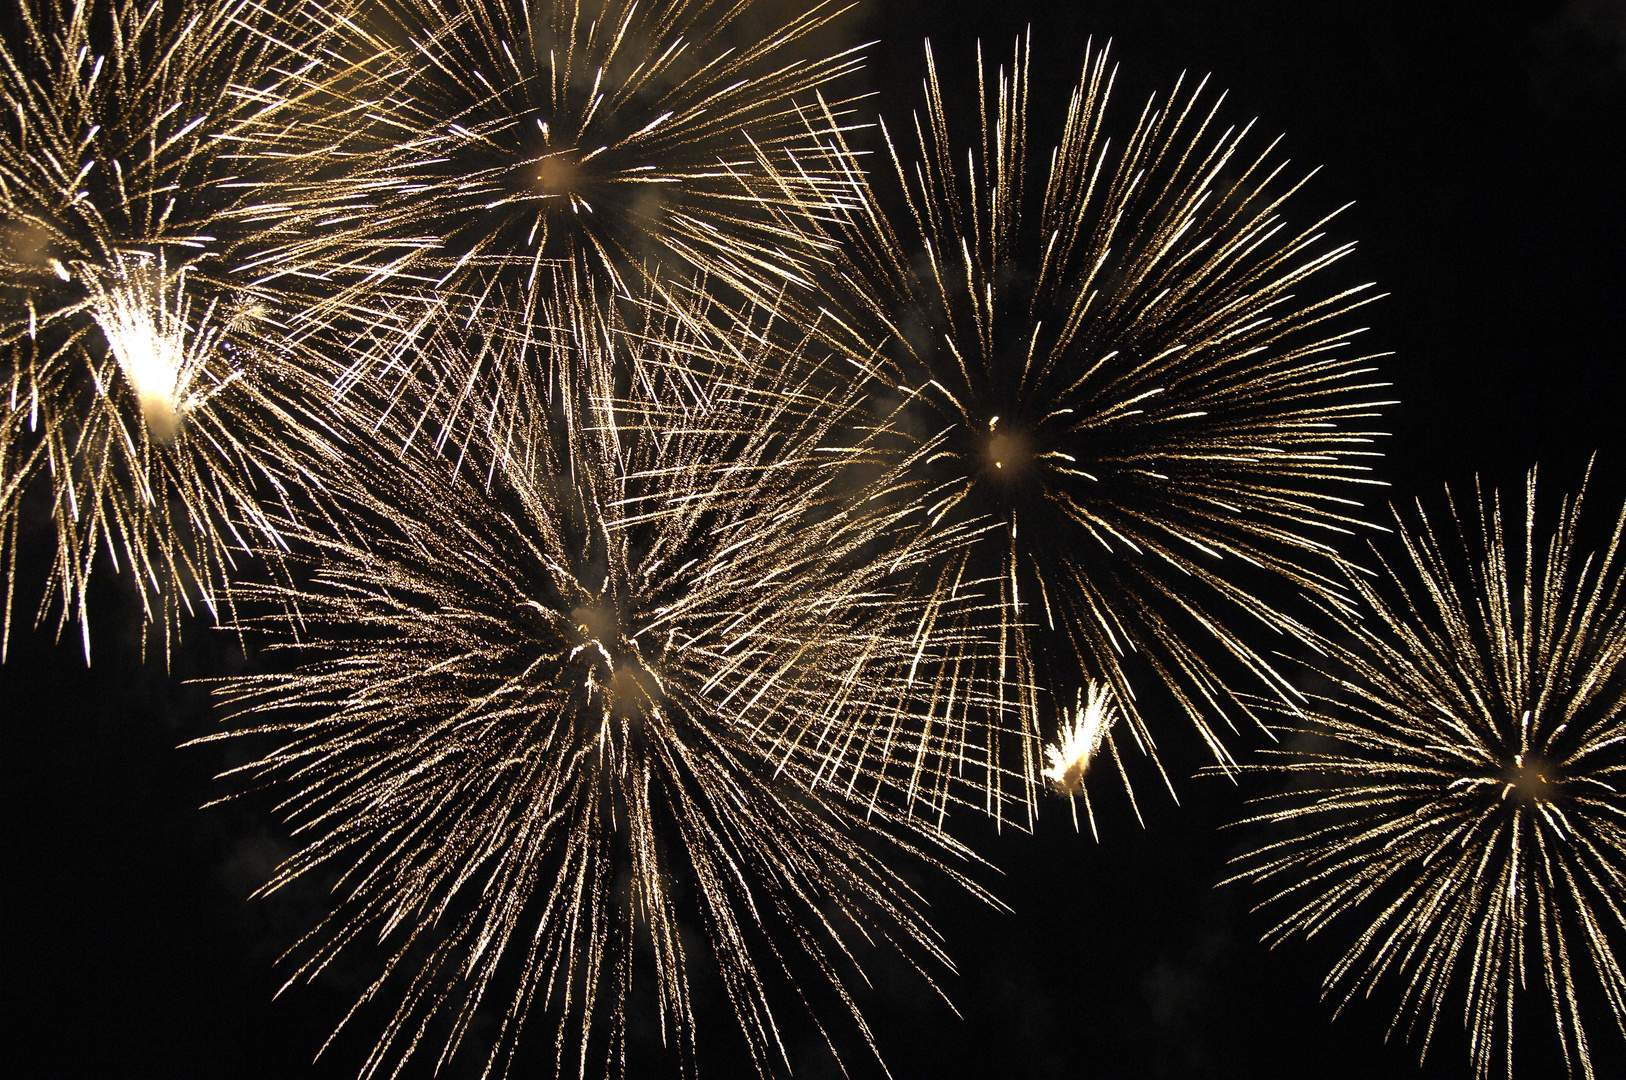 Feuerwerk Herrenhäuser Gärten Elegant Feuerwerk Herrenhäuser Gärten Foto & Bild